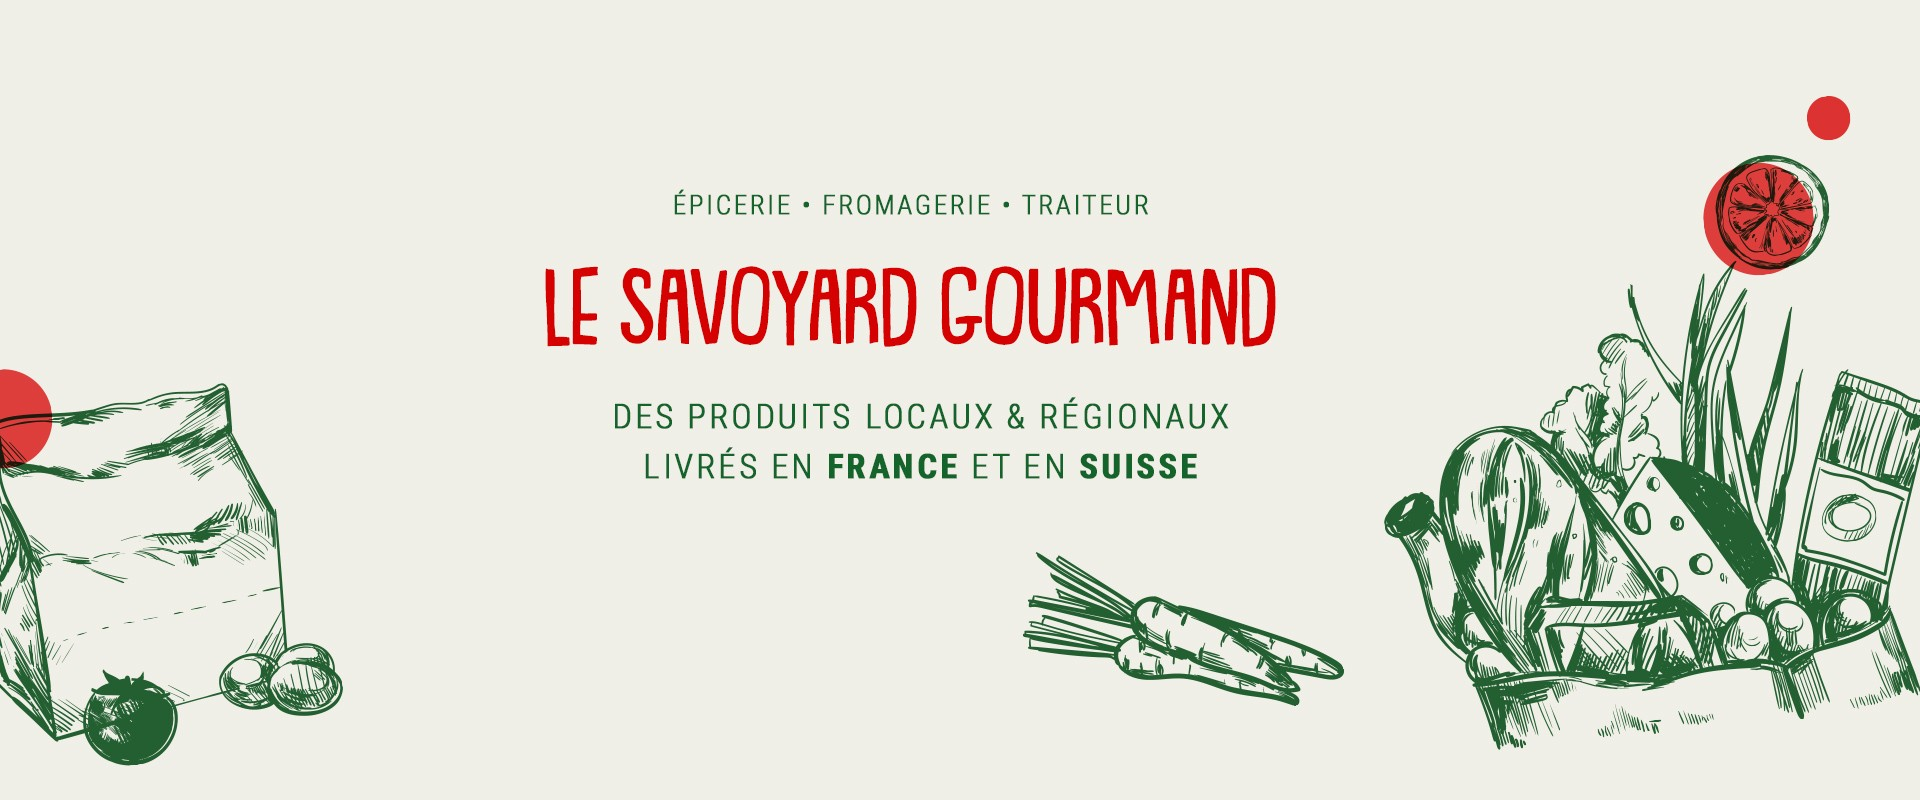 Le Savoyard Gourmand